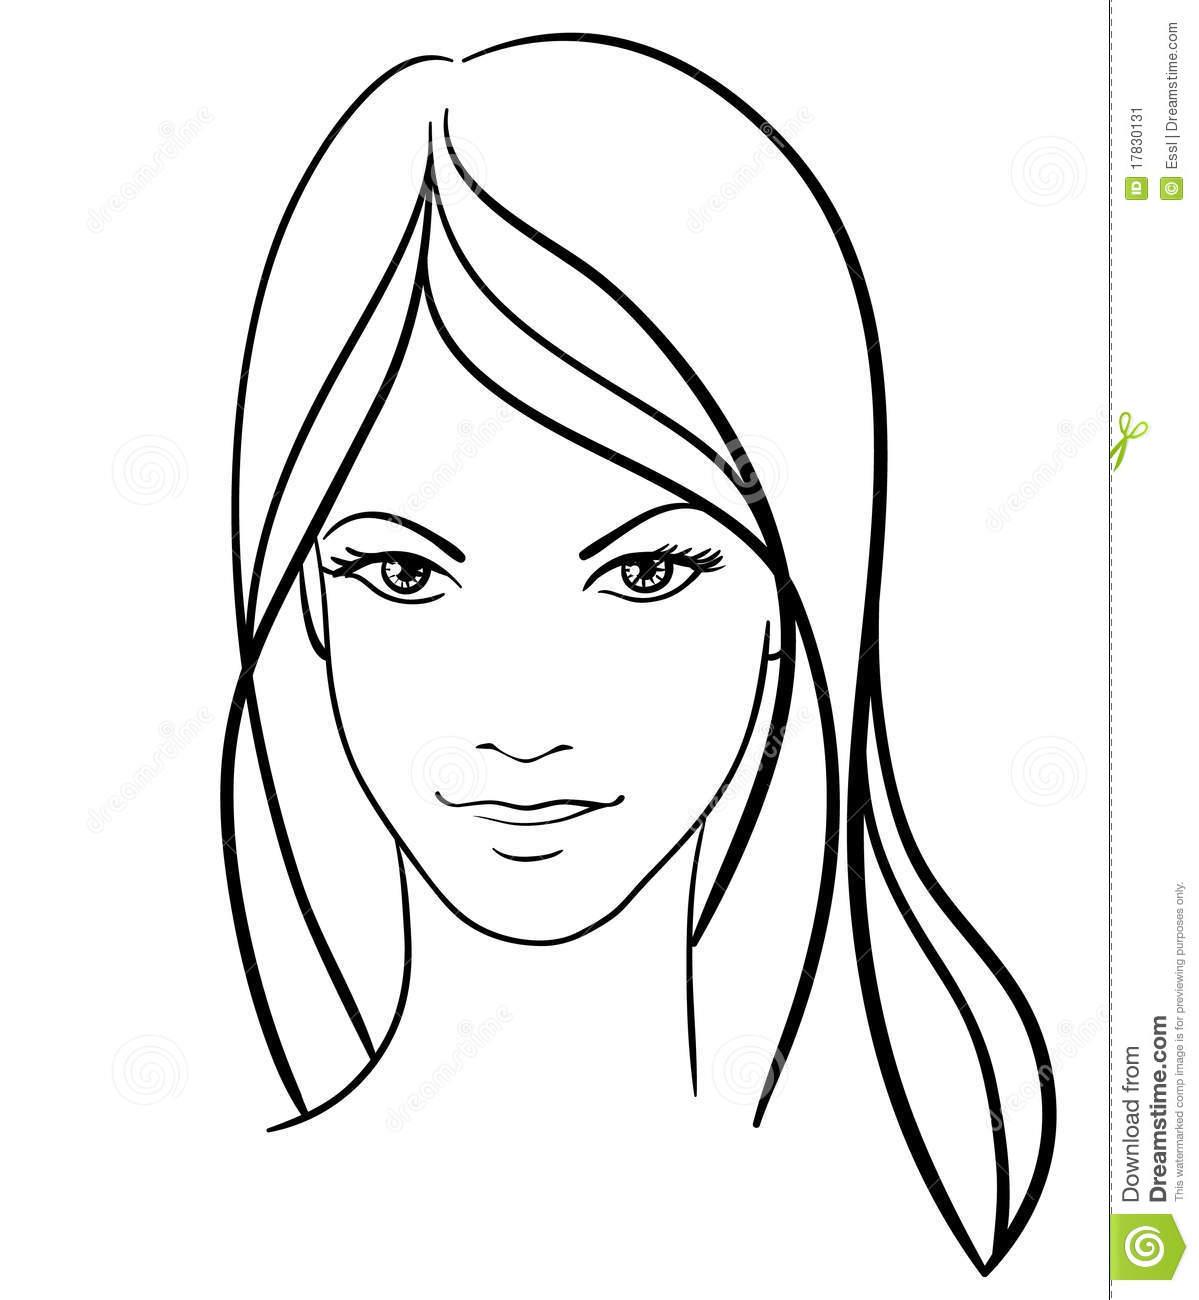 1199x1300 Sketch Face Girl Simple Beauty Girl Face Icon Stencil Ideas